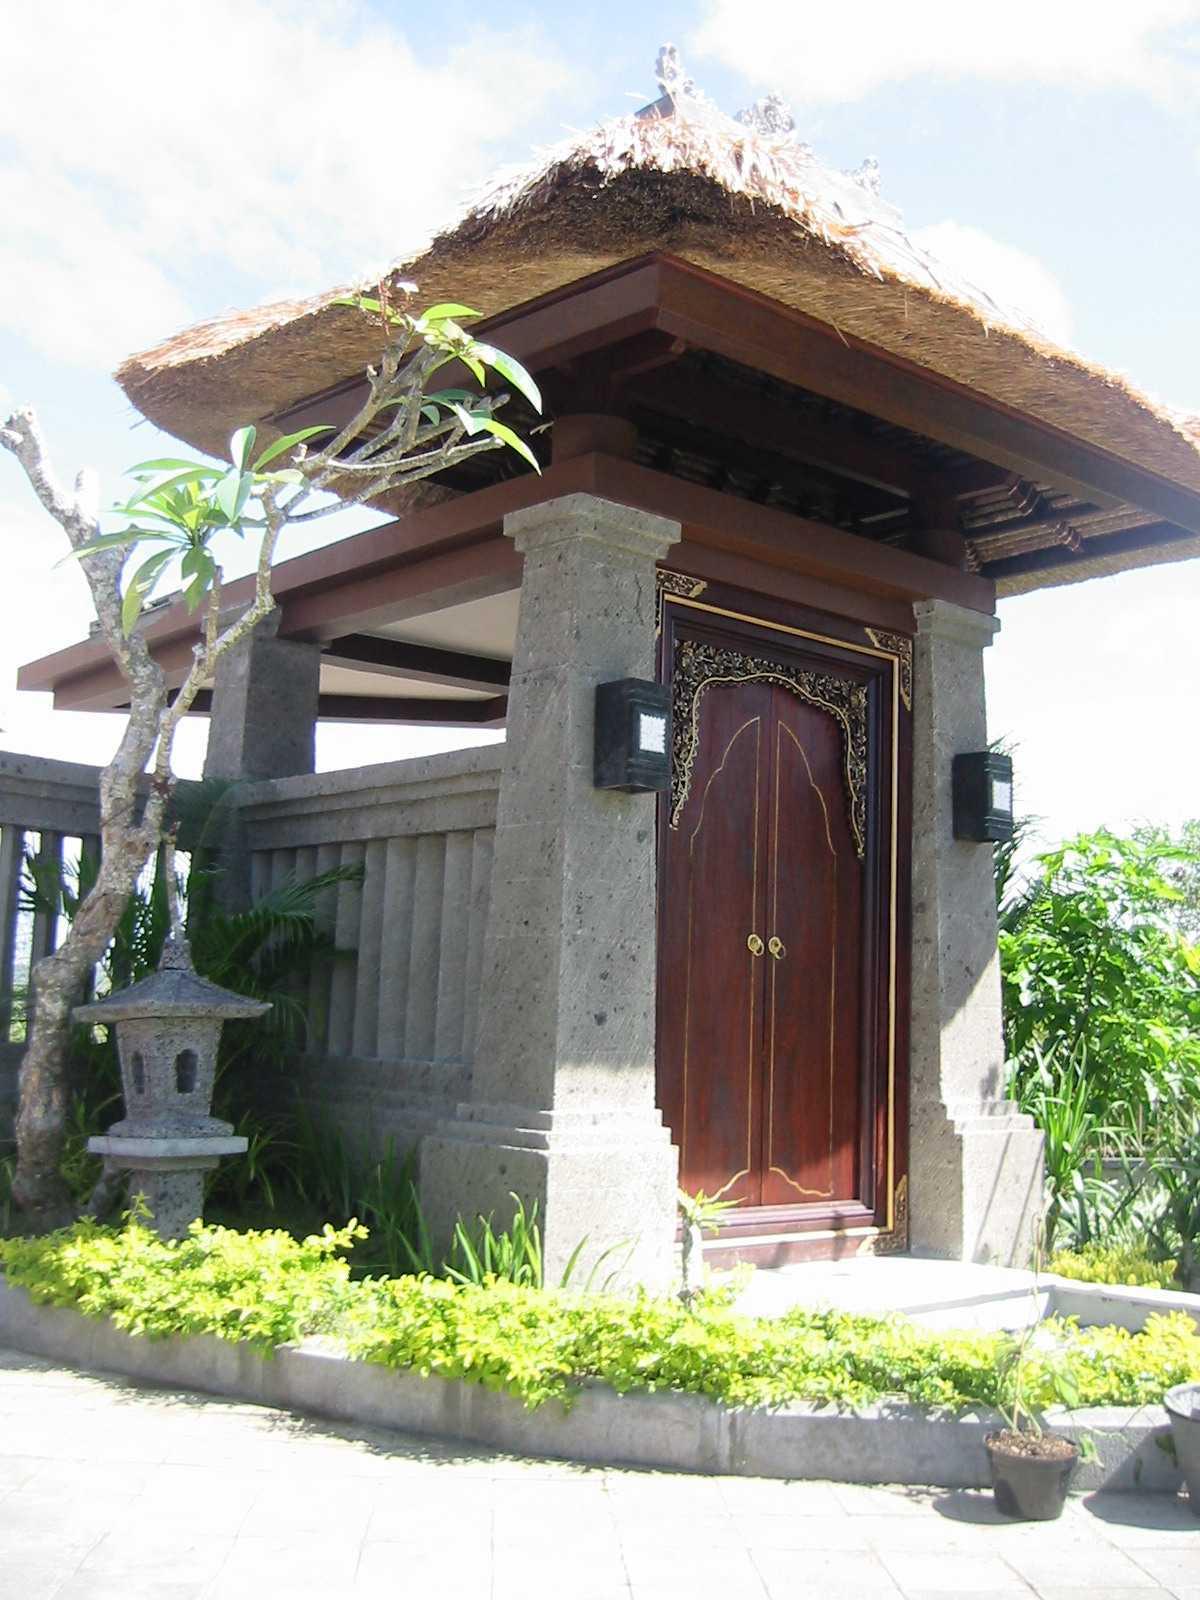 Yohanes Adi Wiyanto Villa Ungasan Hill Ungasan, Kec. Kuta Sel., Kabupaten Badung, Bali, Indonesia Ungasan, Kec. Kuta Sel., Kabupaten Badung, Bali, Indonesia Yohanes-Adi-Wiyanto-Villa-Ungasan-Hill  125984